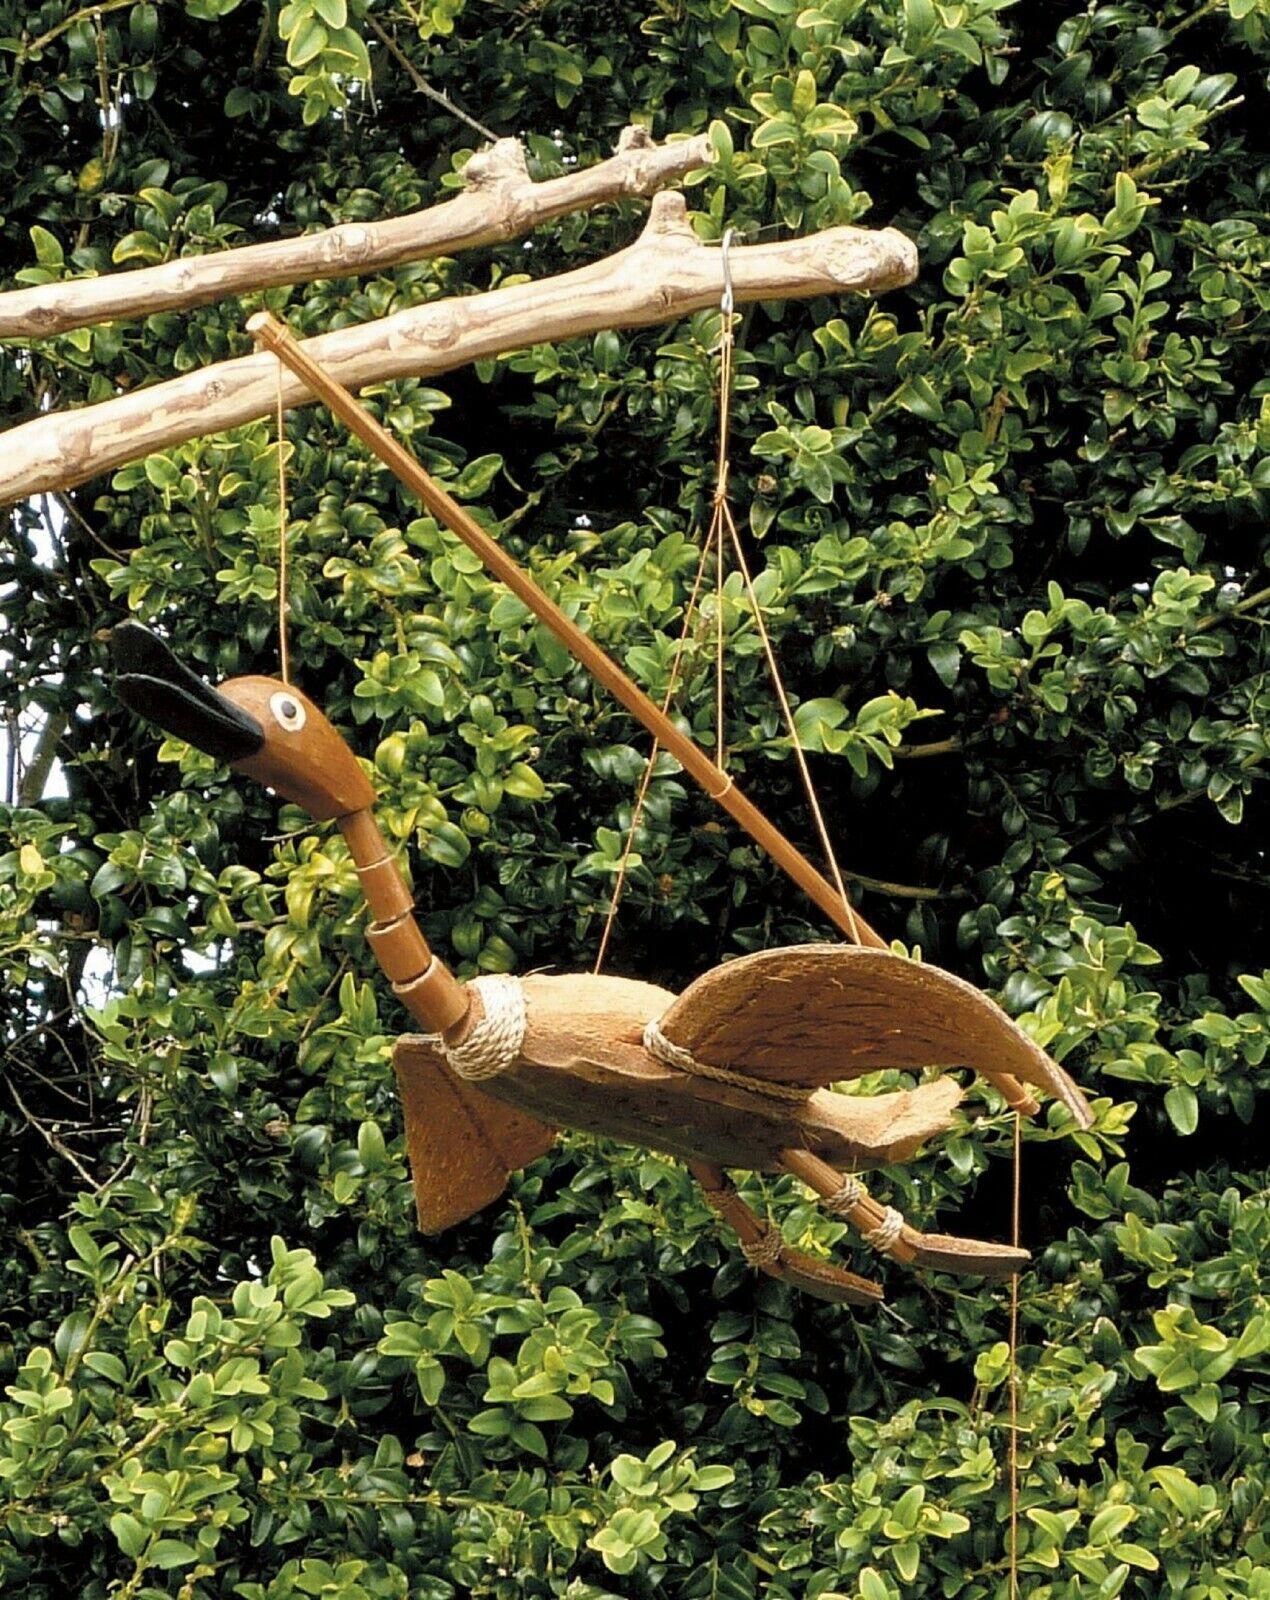 Flying Duck Bamboo Coconut Garden Ornament Hanging Bobbing Head Fair Trade